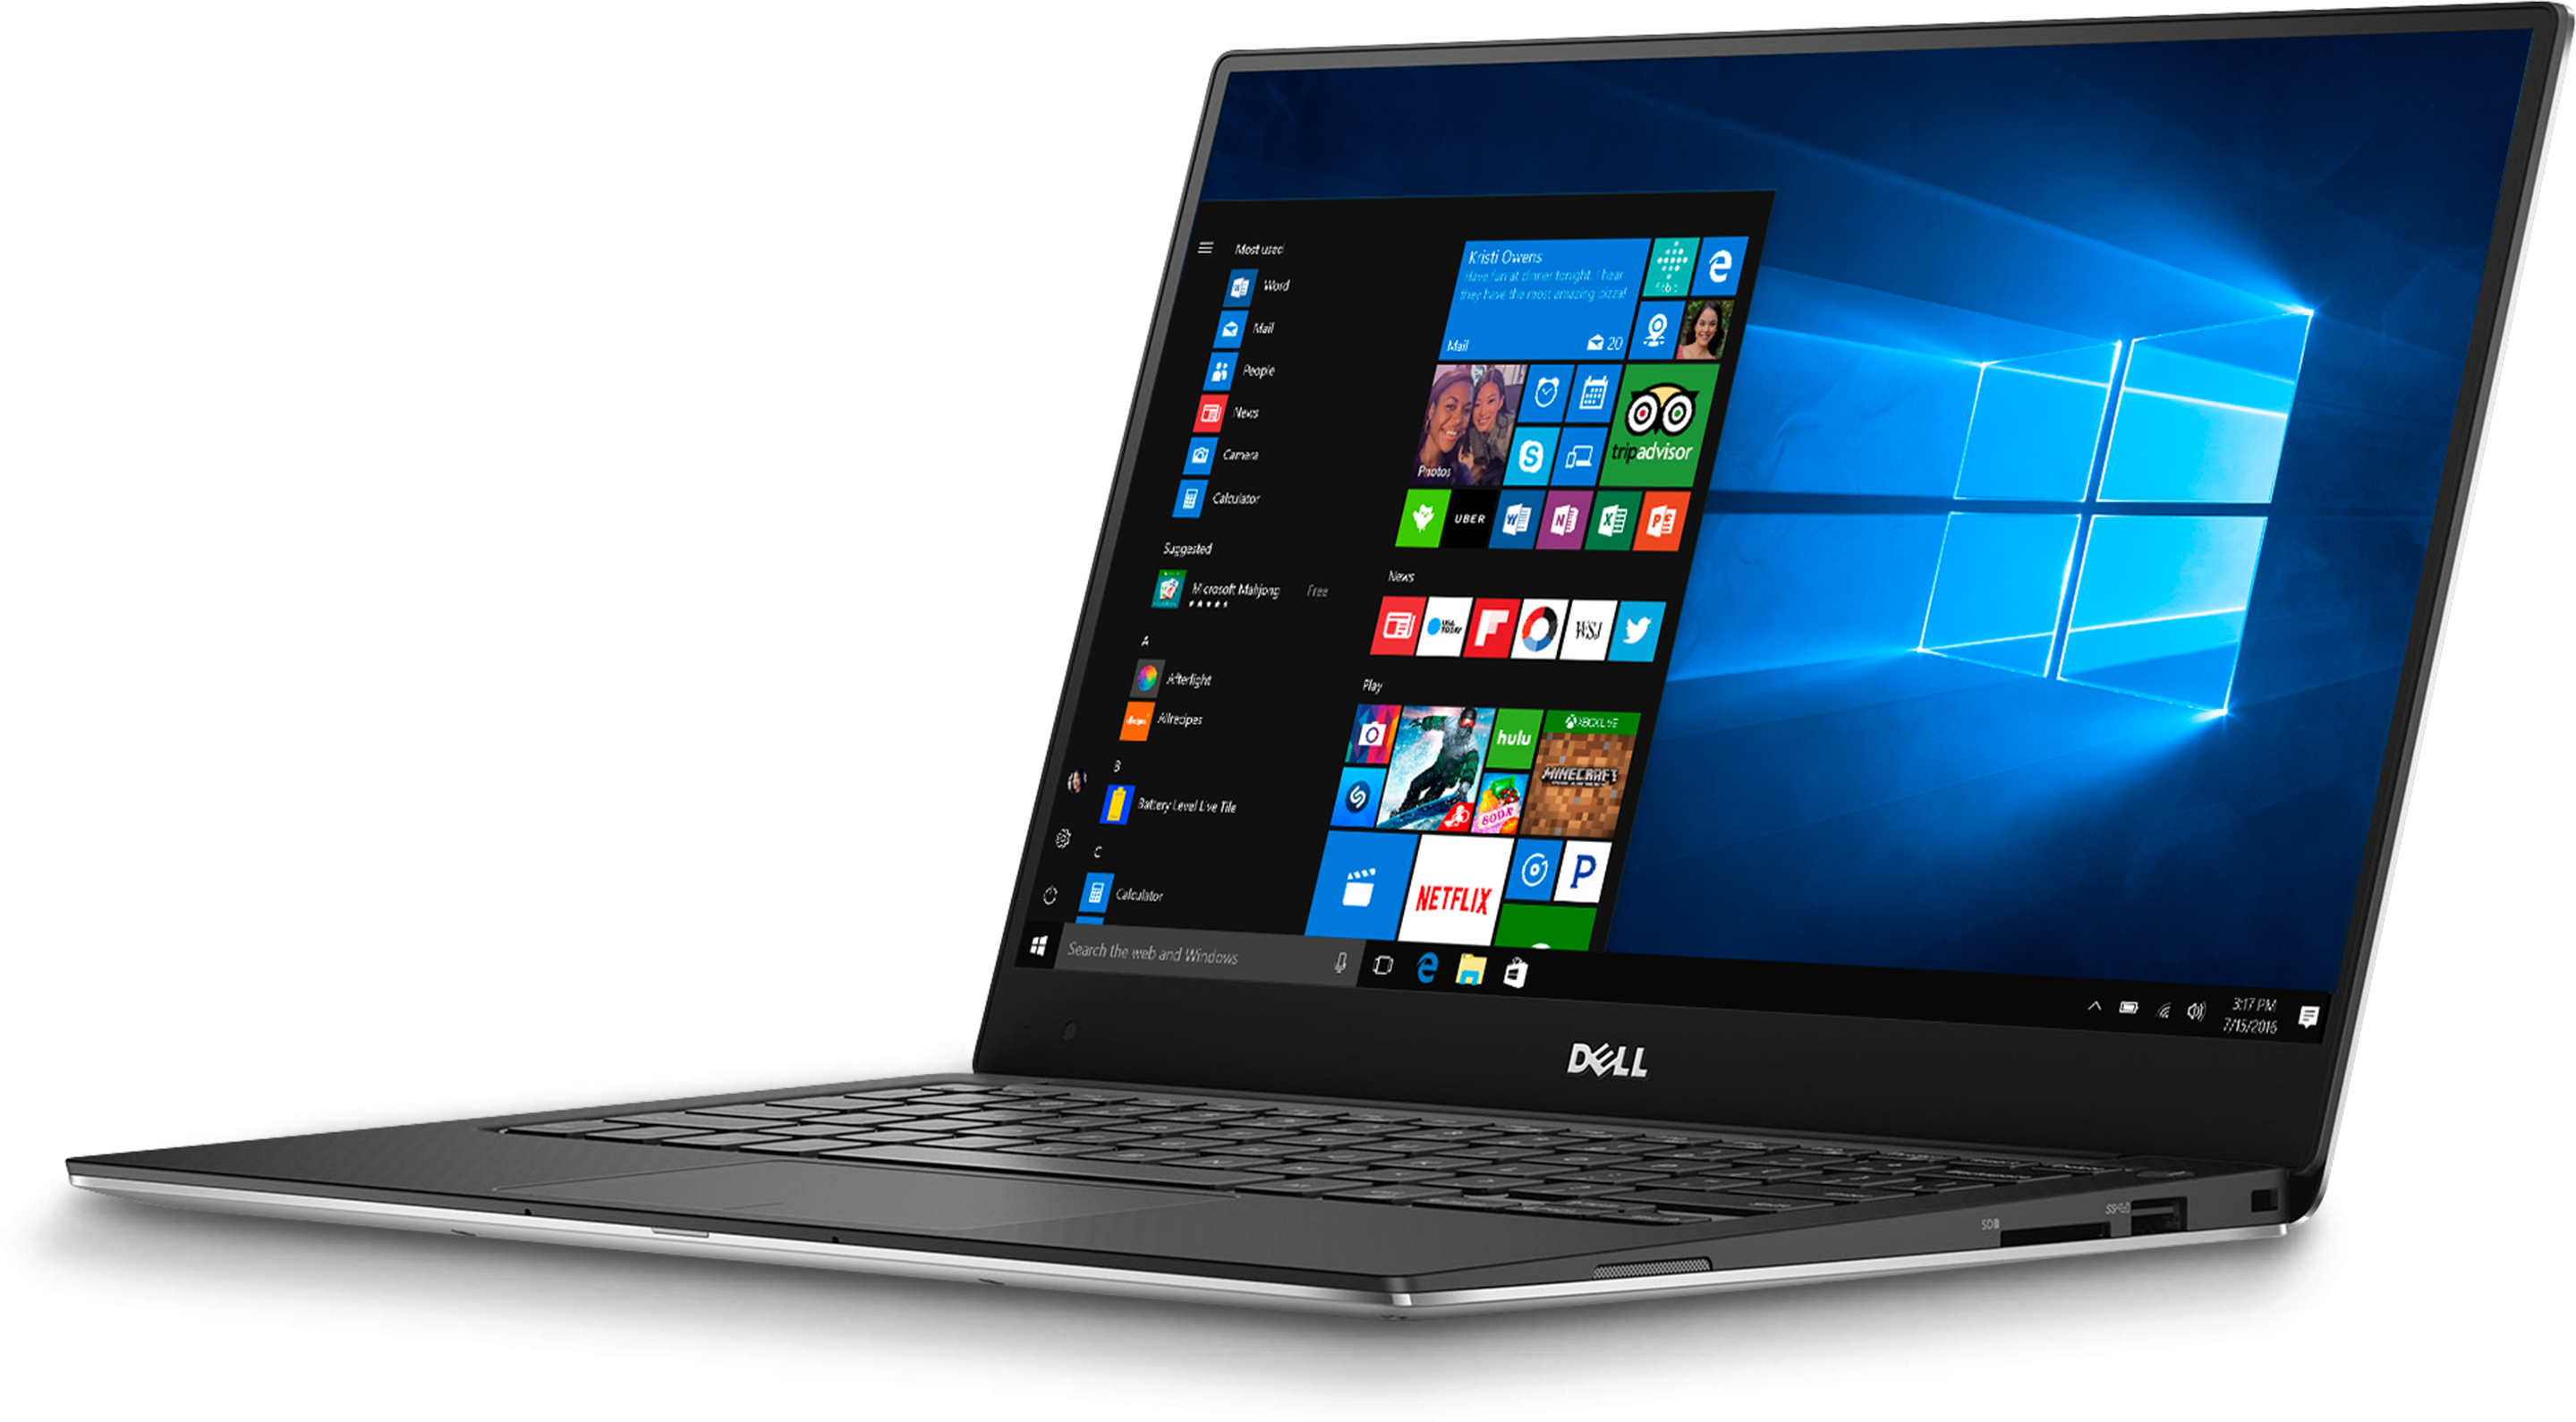 Dell XPS 13 9360 Signature Edition Laptop